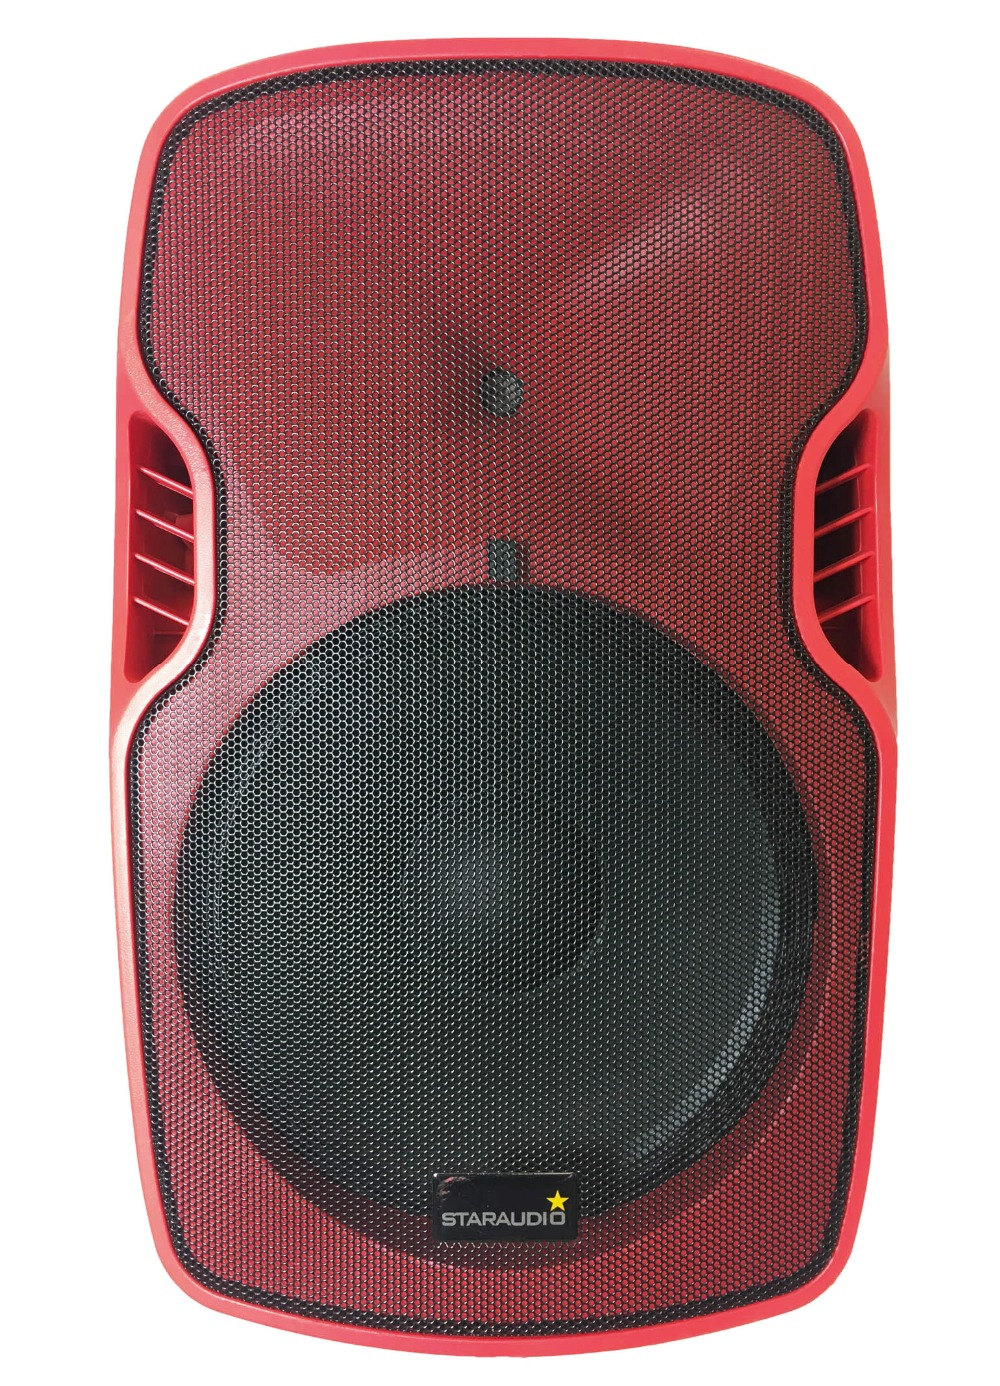 STARAUDIO Red 3500W 15 Powered Active Stage USB SD FM BT PA DJ Speaker with 2CH UHF Wireless Mics 1 Stand 1 Wired Mic SSRM-15